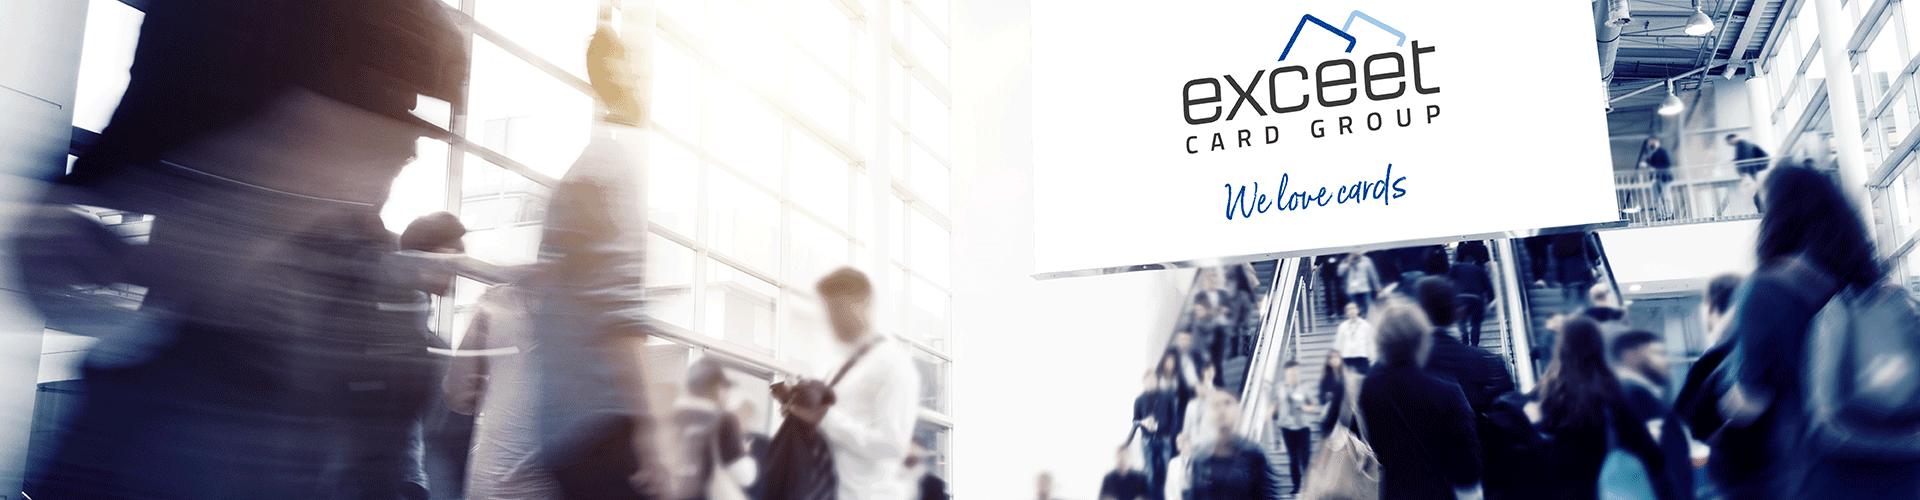 Events & Messen - exceet Card Group